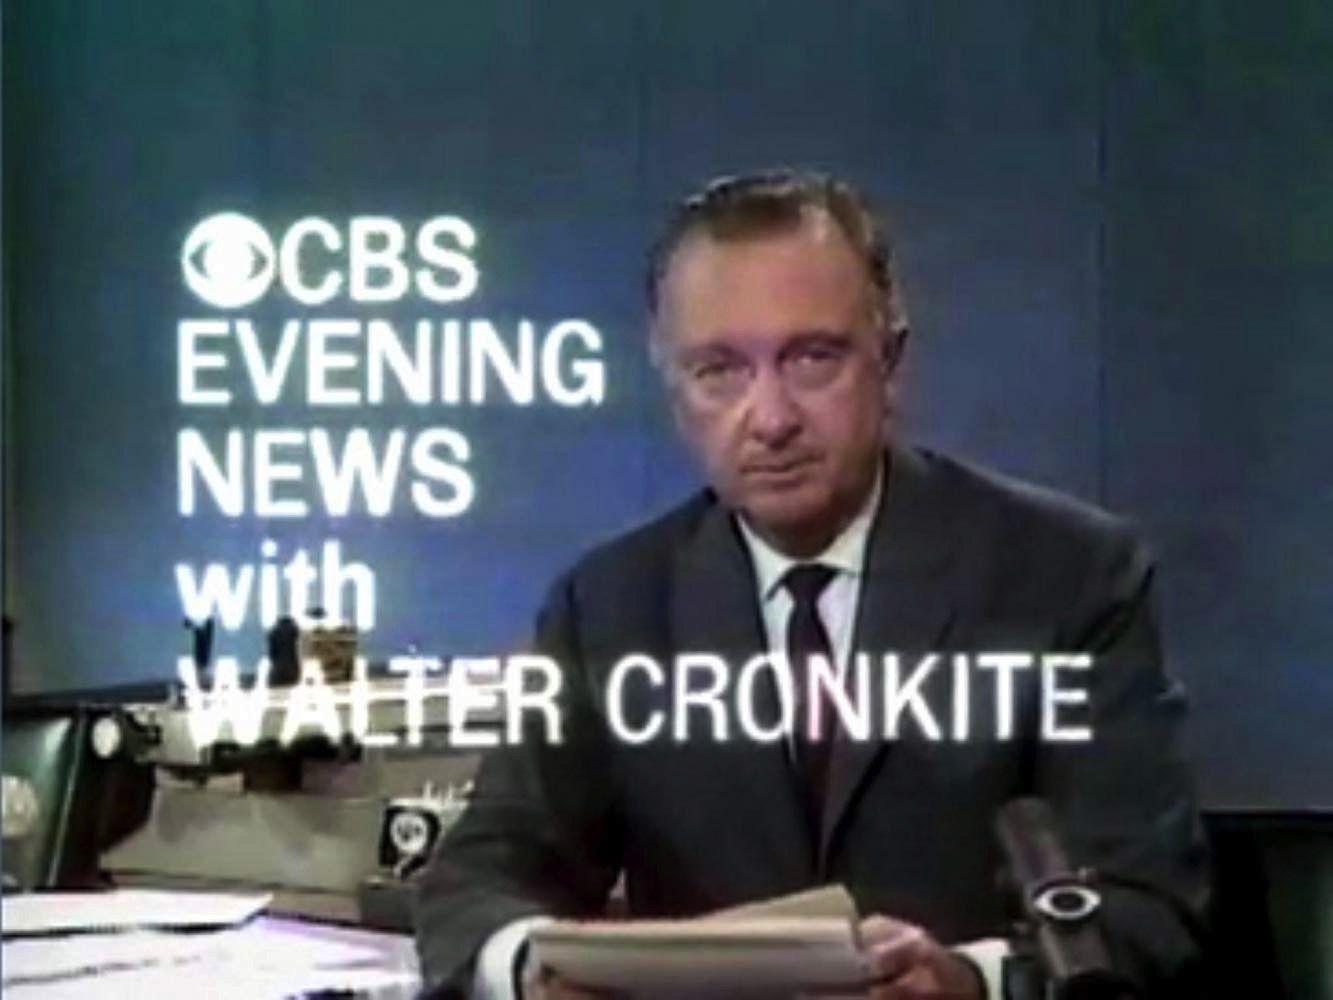 Walter Cronkite and the CBS News